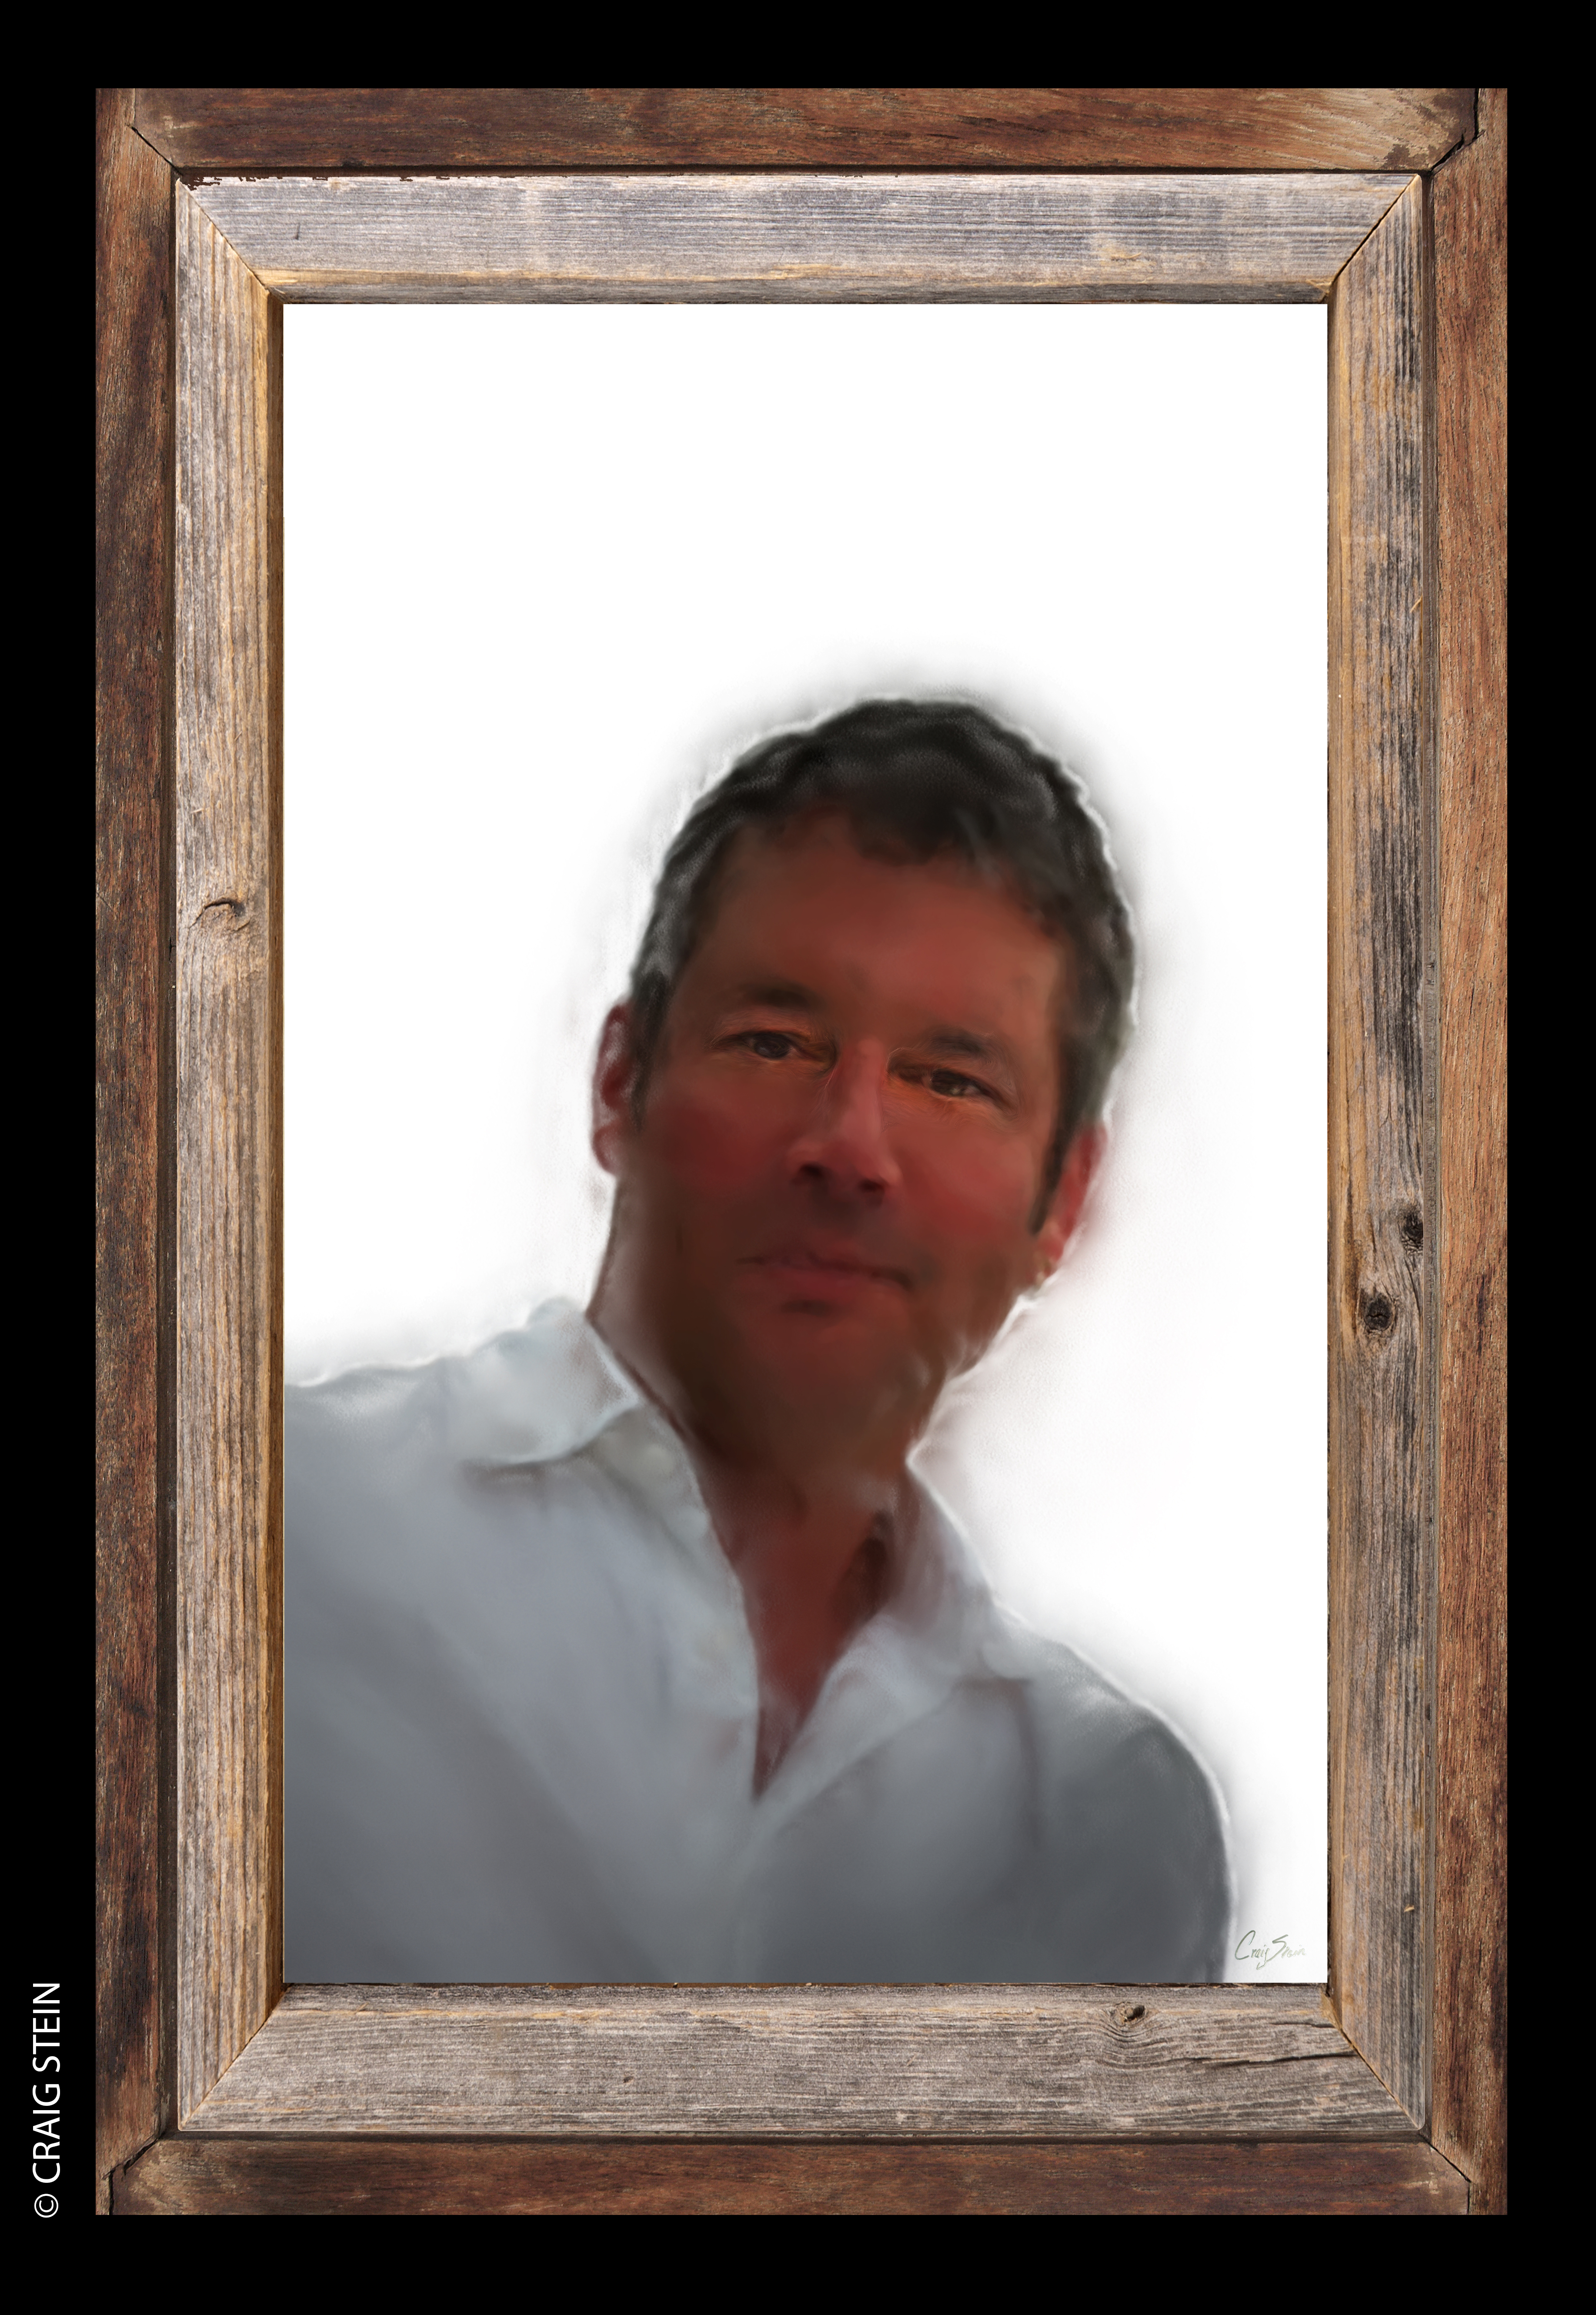 Steve Hodges Portrait By Craig Stein